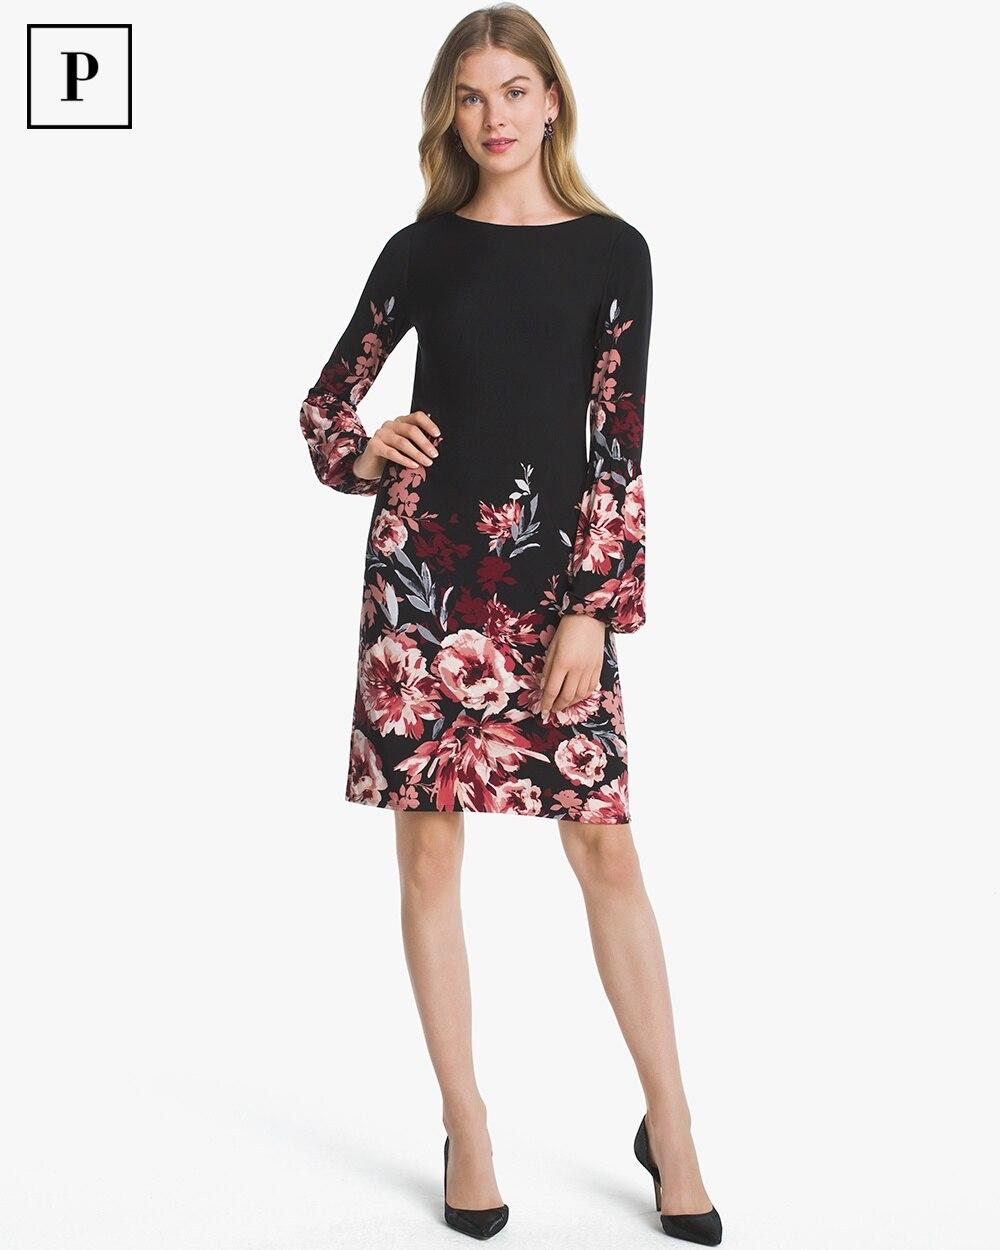 6bd5c97cfa6 Petite Long-Sleeve Floral Knit Shift Dress - White House Black Market